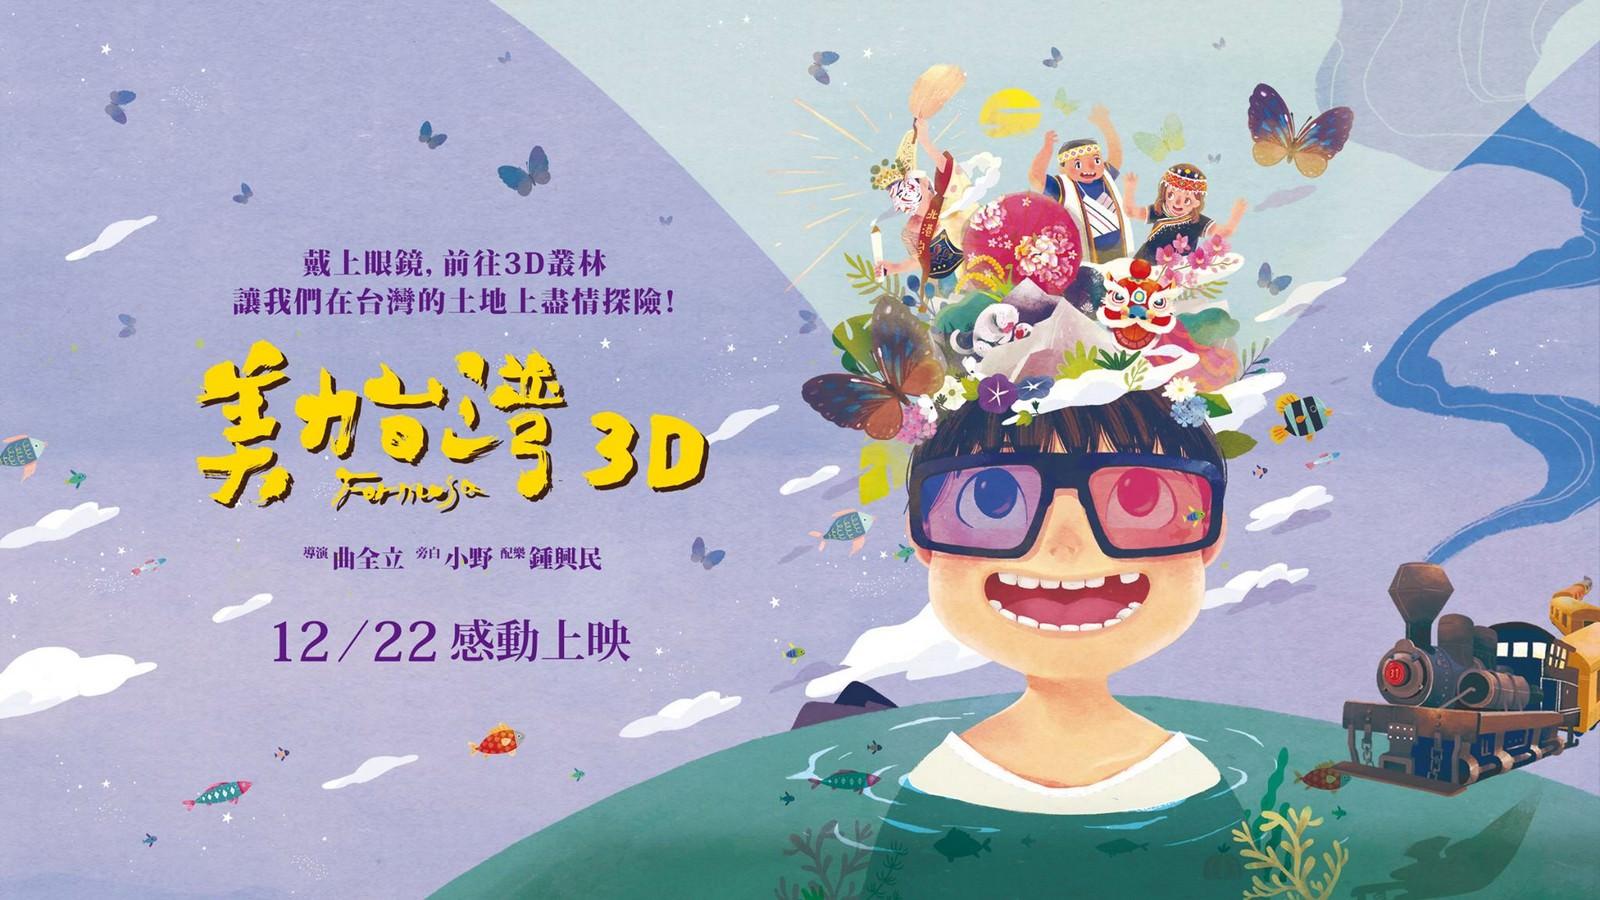 Movie, 美力台灣3D(台灣, 2017) / Formosa(英文), 電影海報, 台灣, 橫版